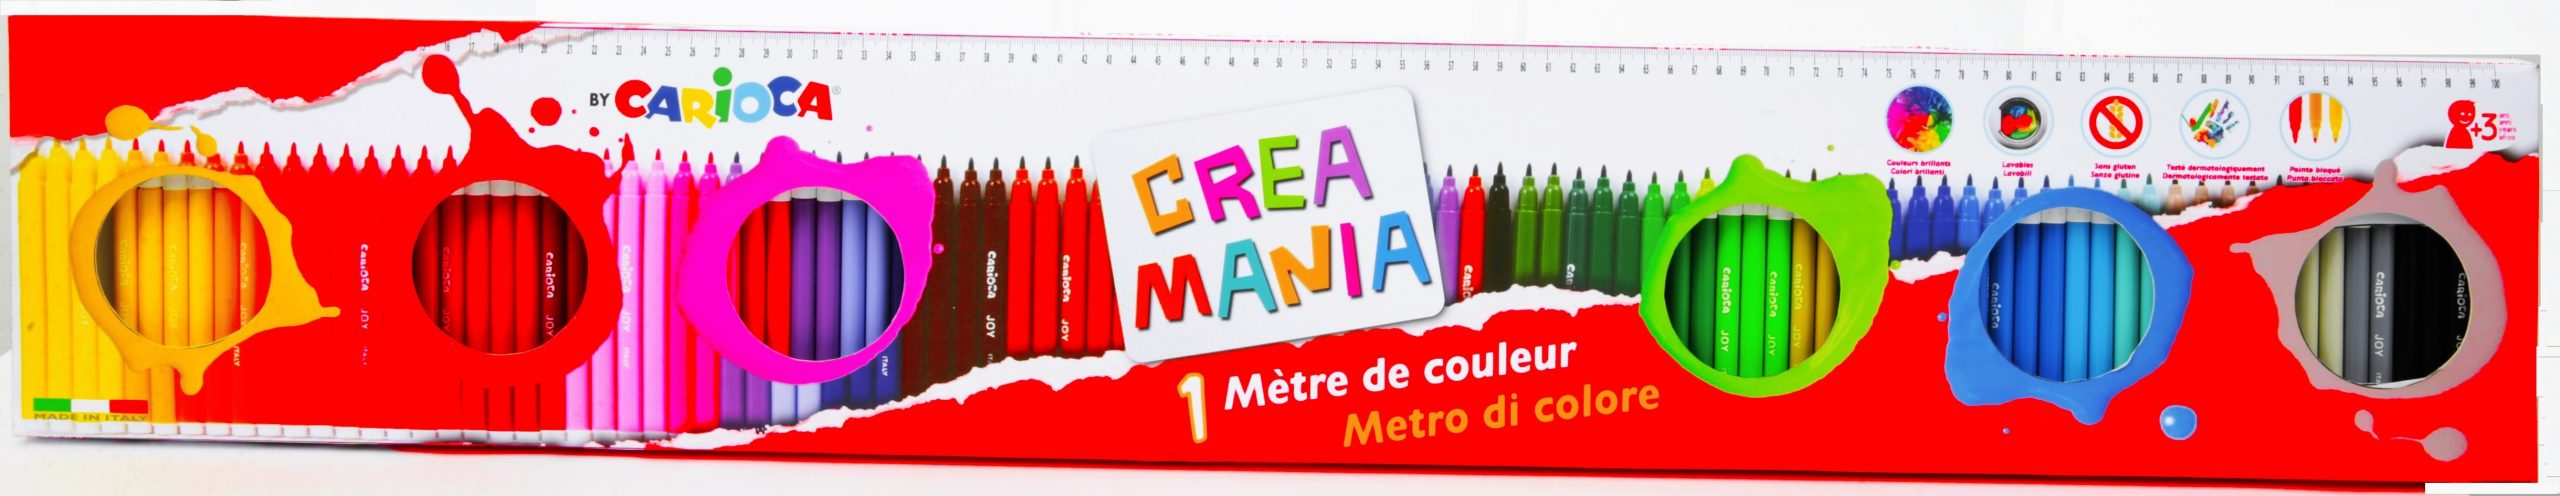 Creamania 1 Μέτρο Χρώματος